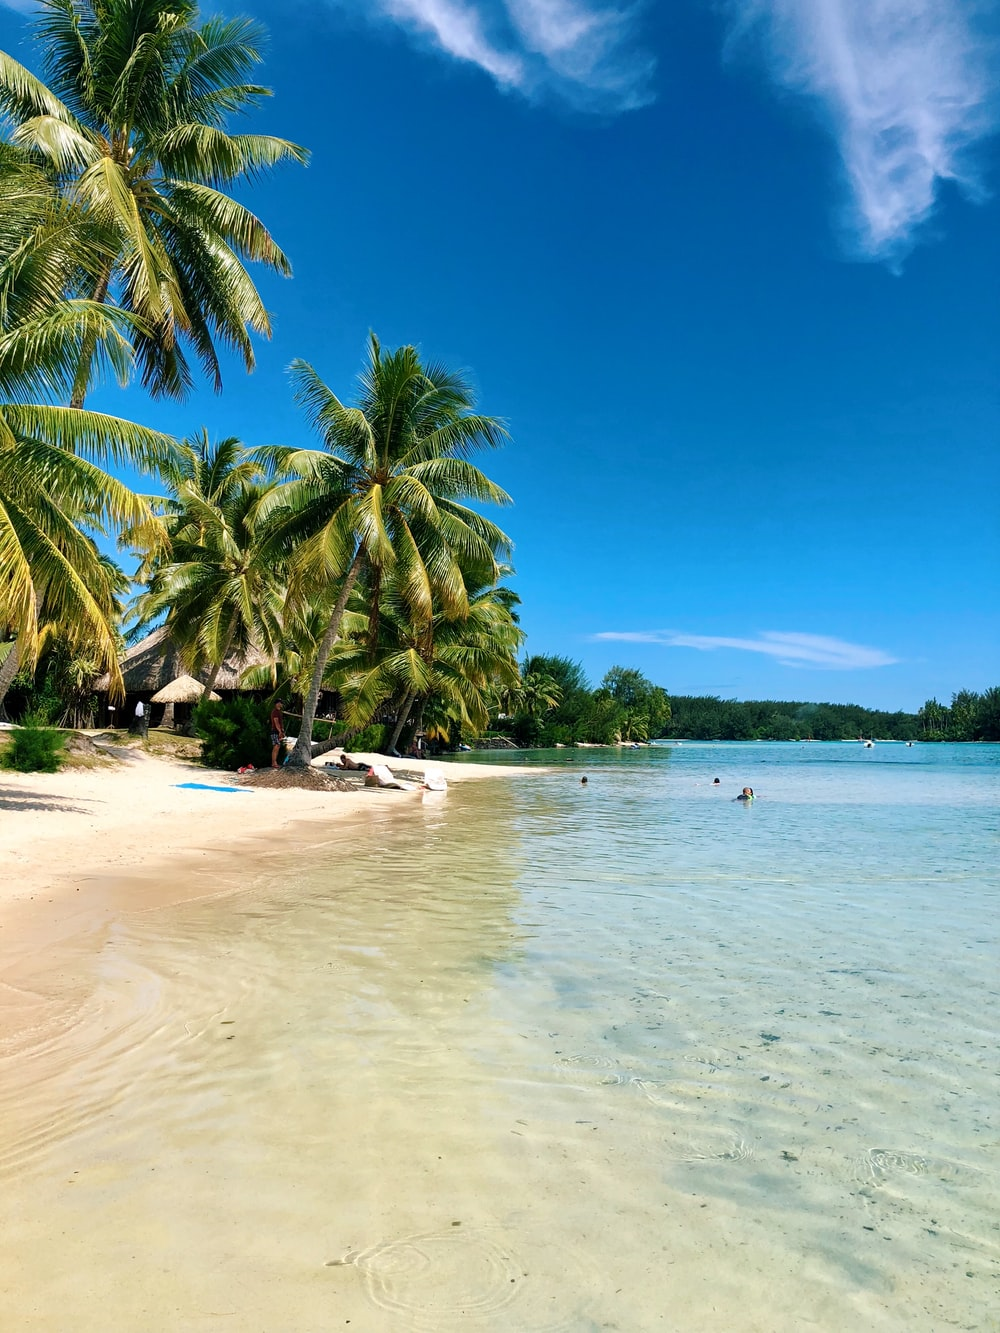 coconut trees beside ocean